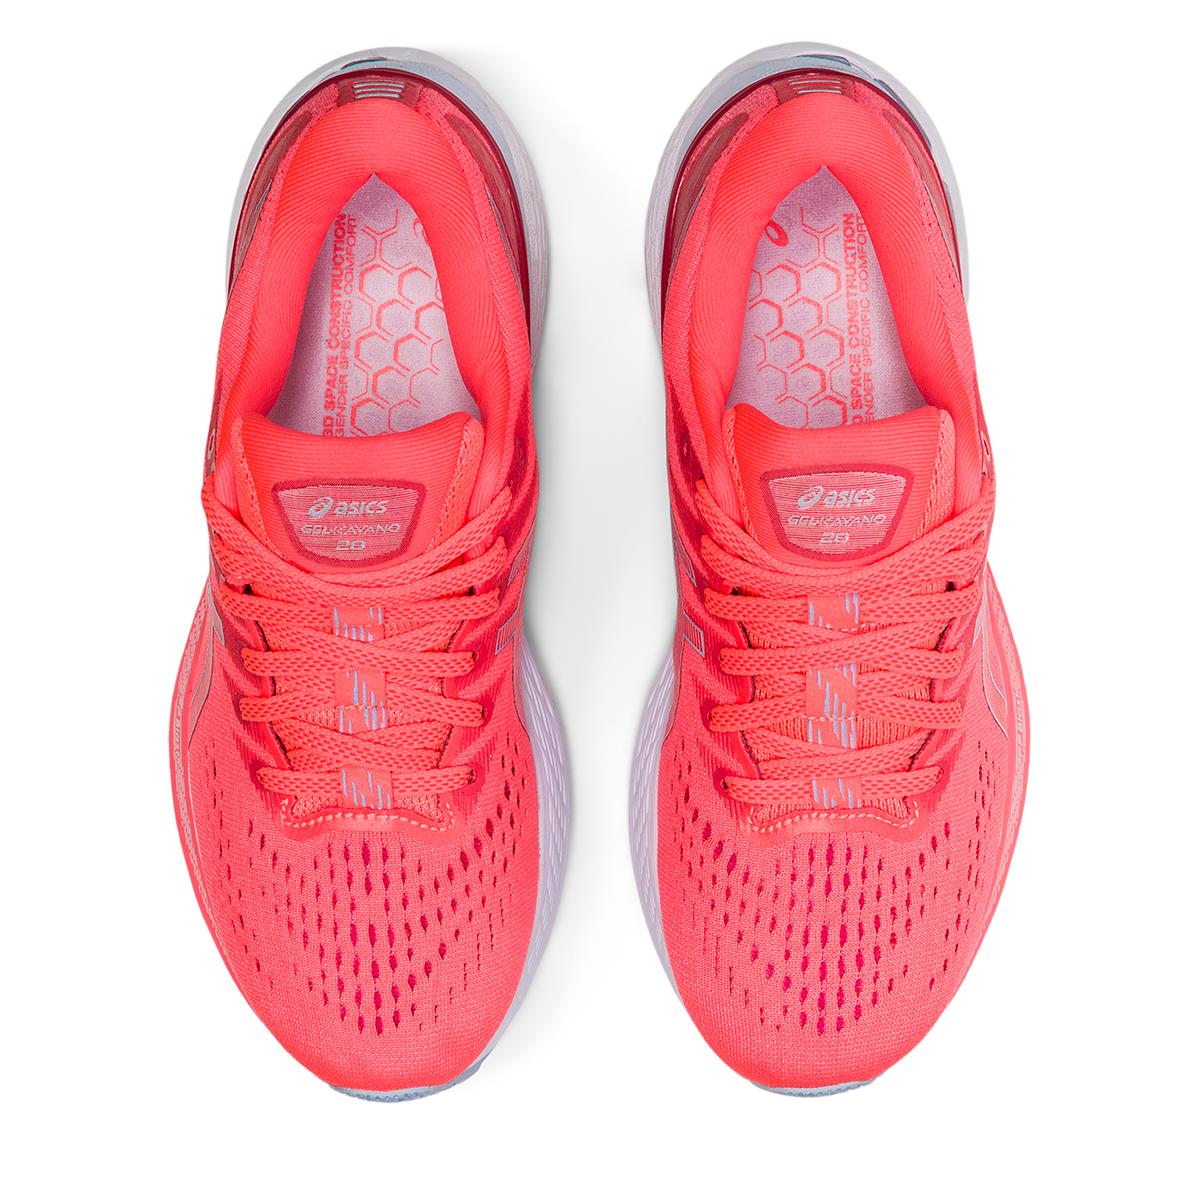 Women's Asics Gel-Kayano 28 Running Shoe - Color: Blazing Coral - Size: 5 - Width: Regular, Blazing Coral, large, image 3